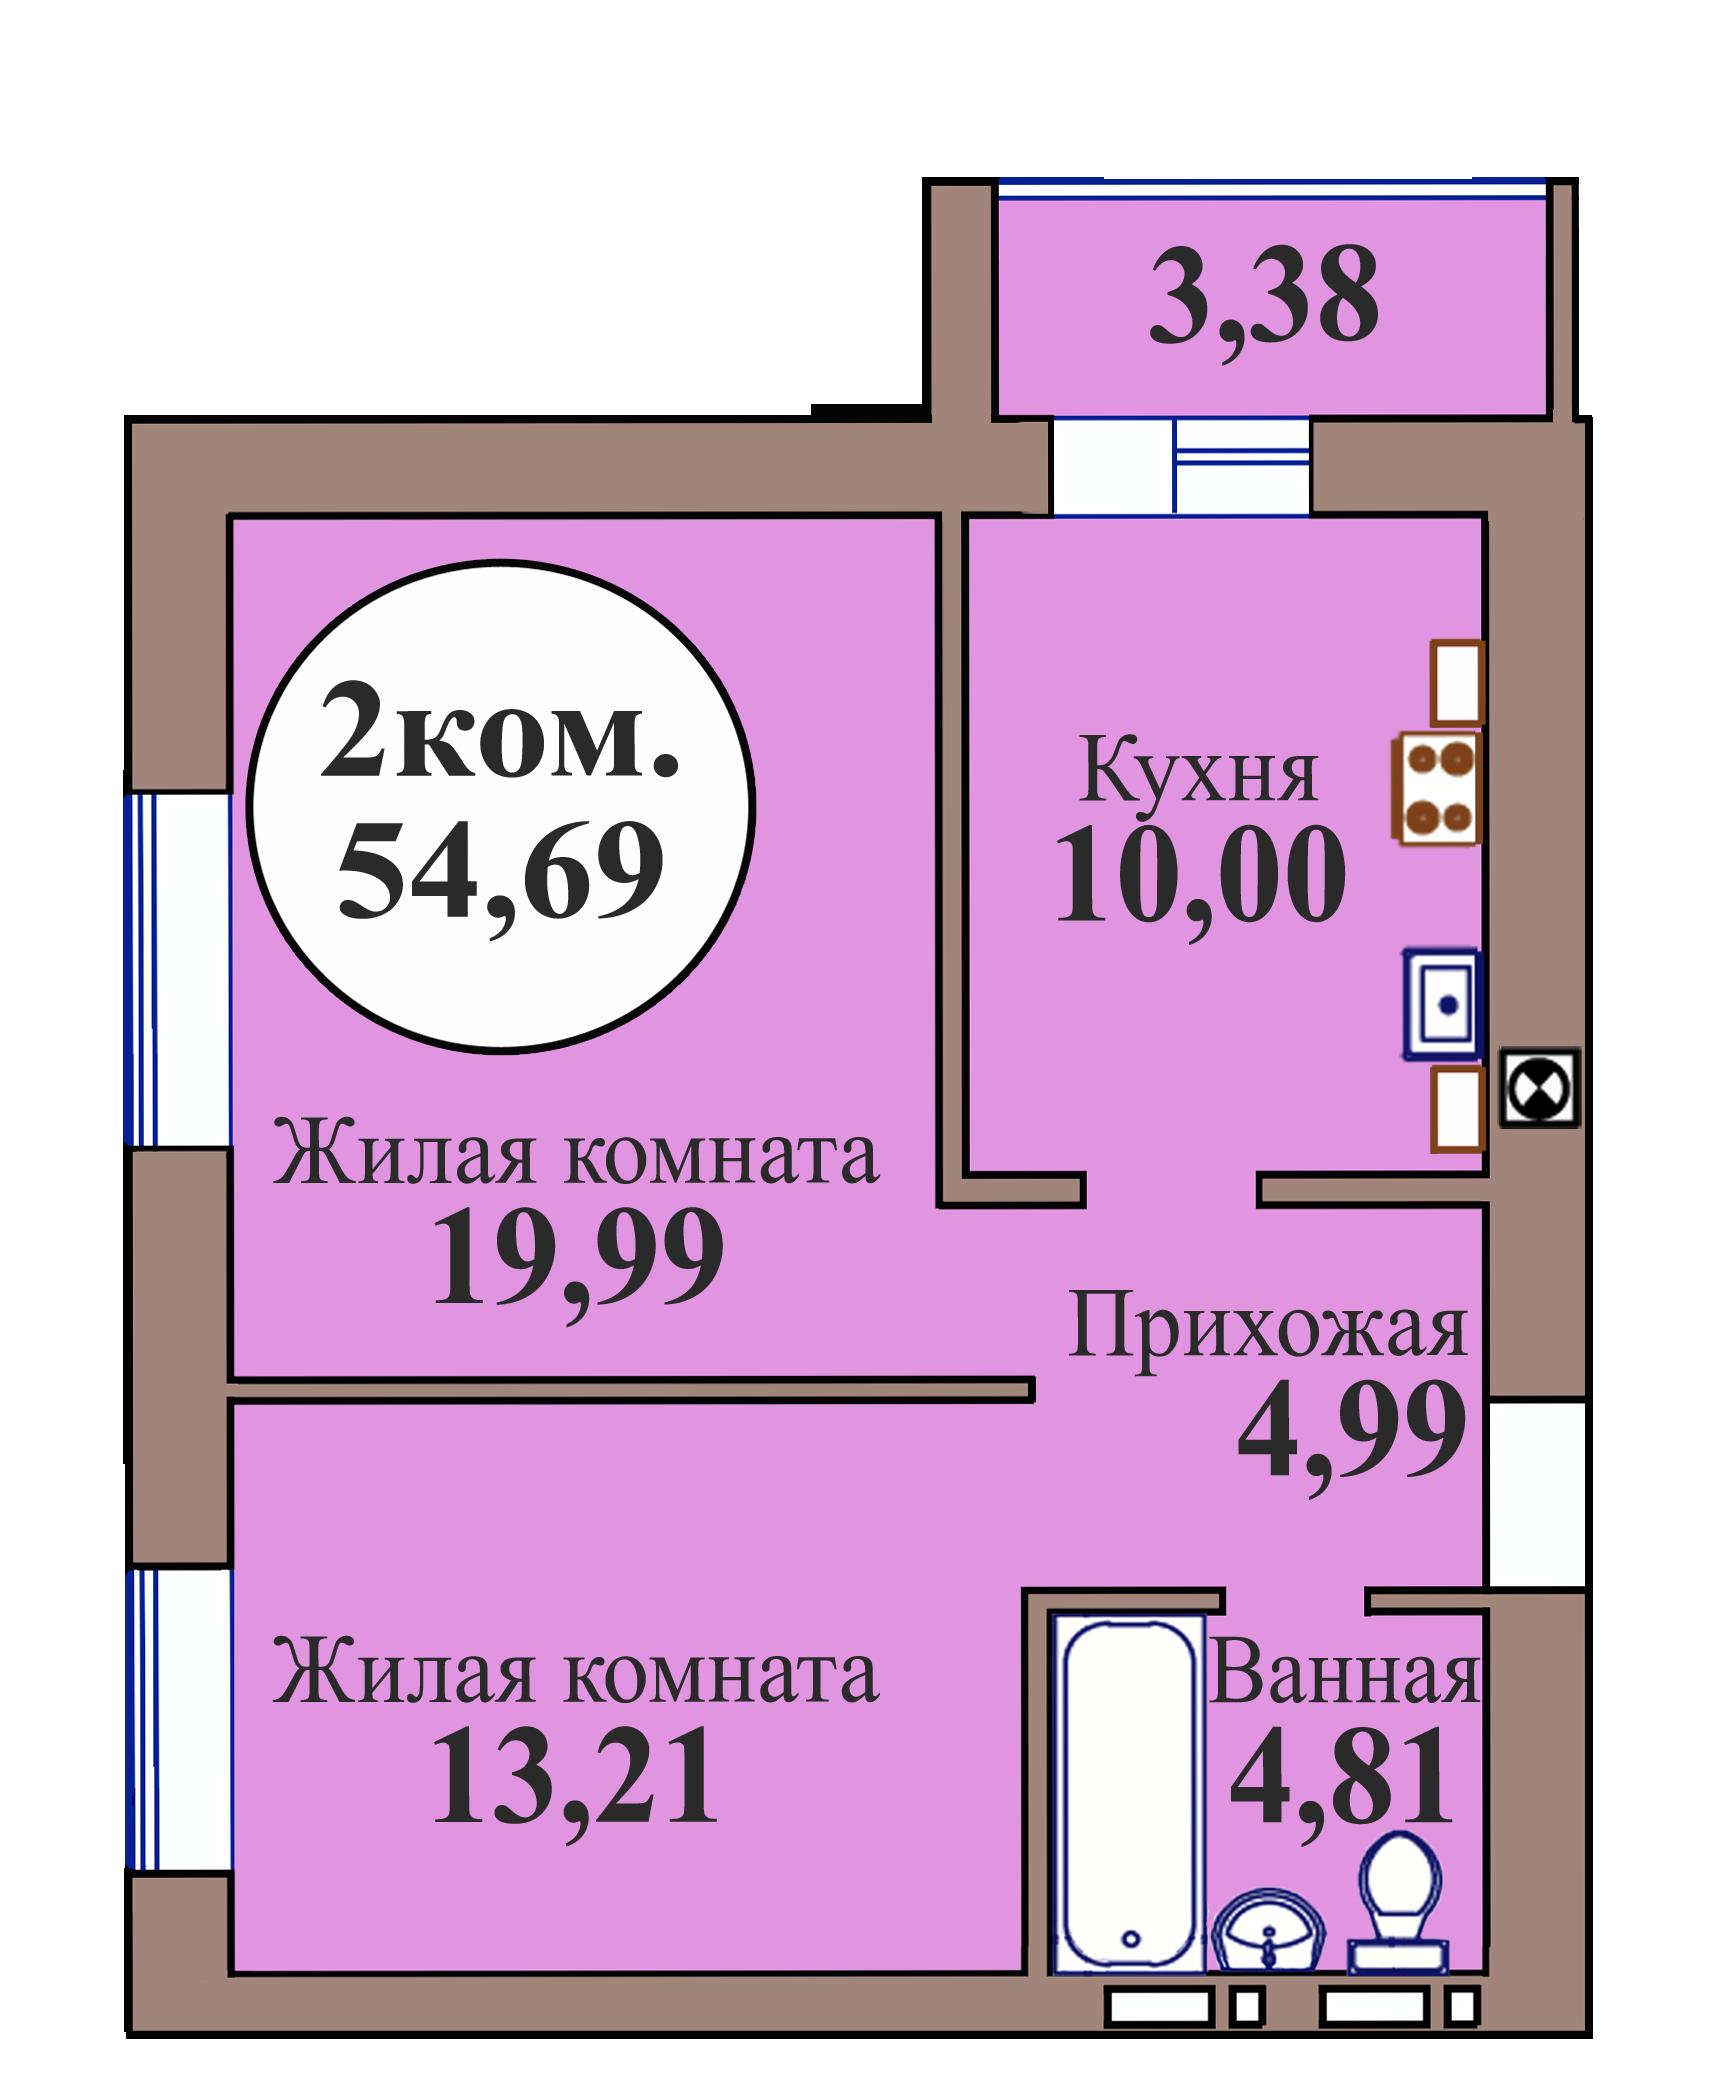 2-комн. кв. по пер. Калининградский, 5 кв. 221 в Калининграде